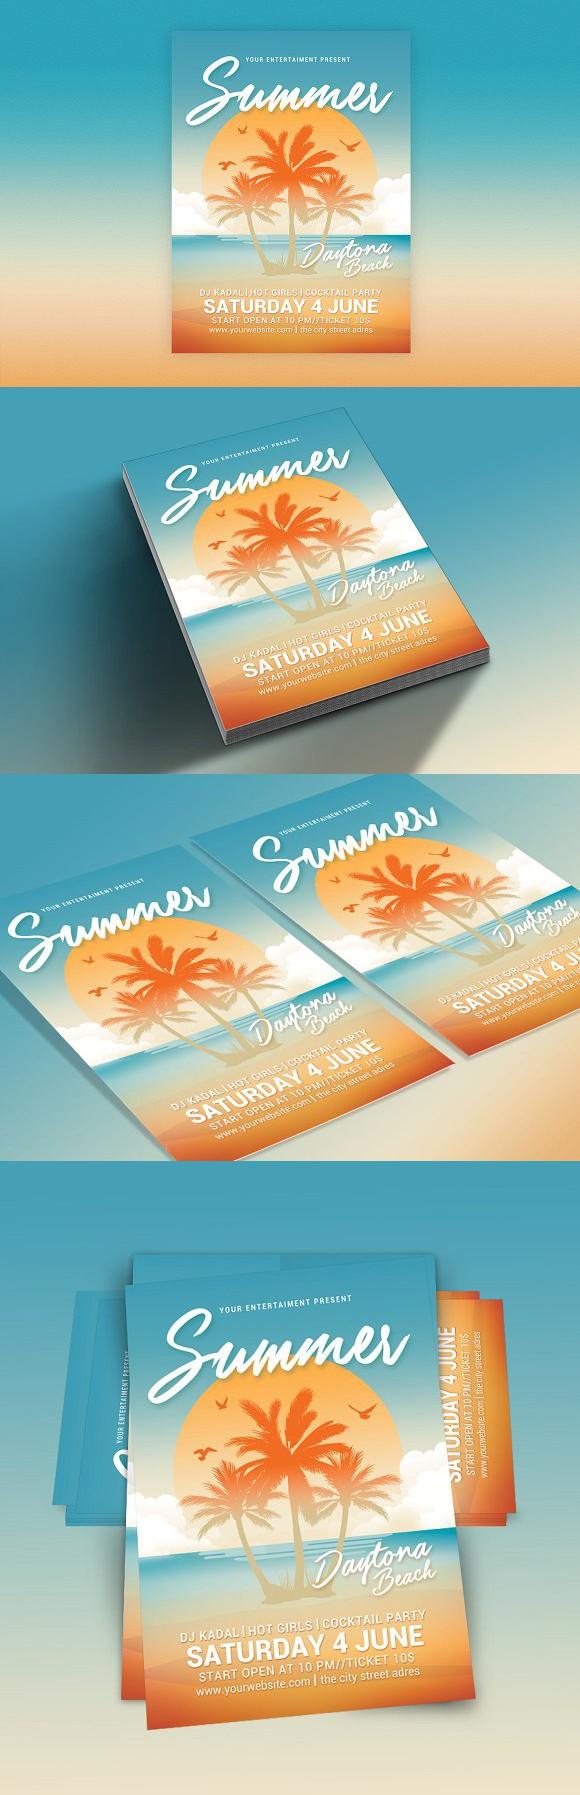 Summer Beach Party. Flyer Templates